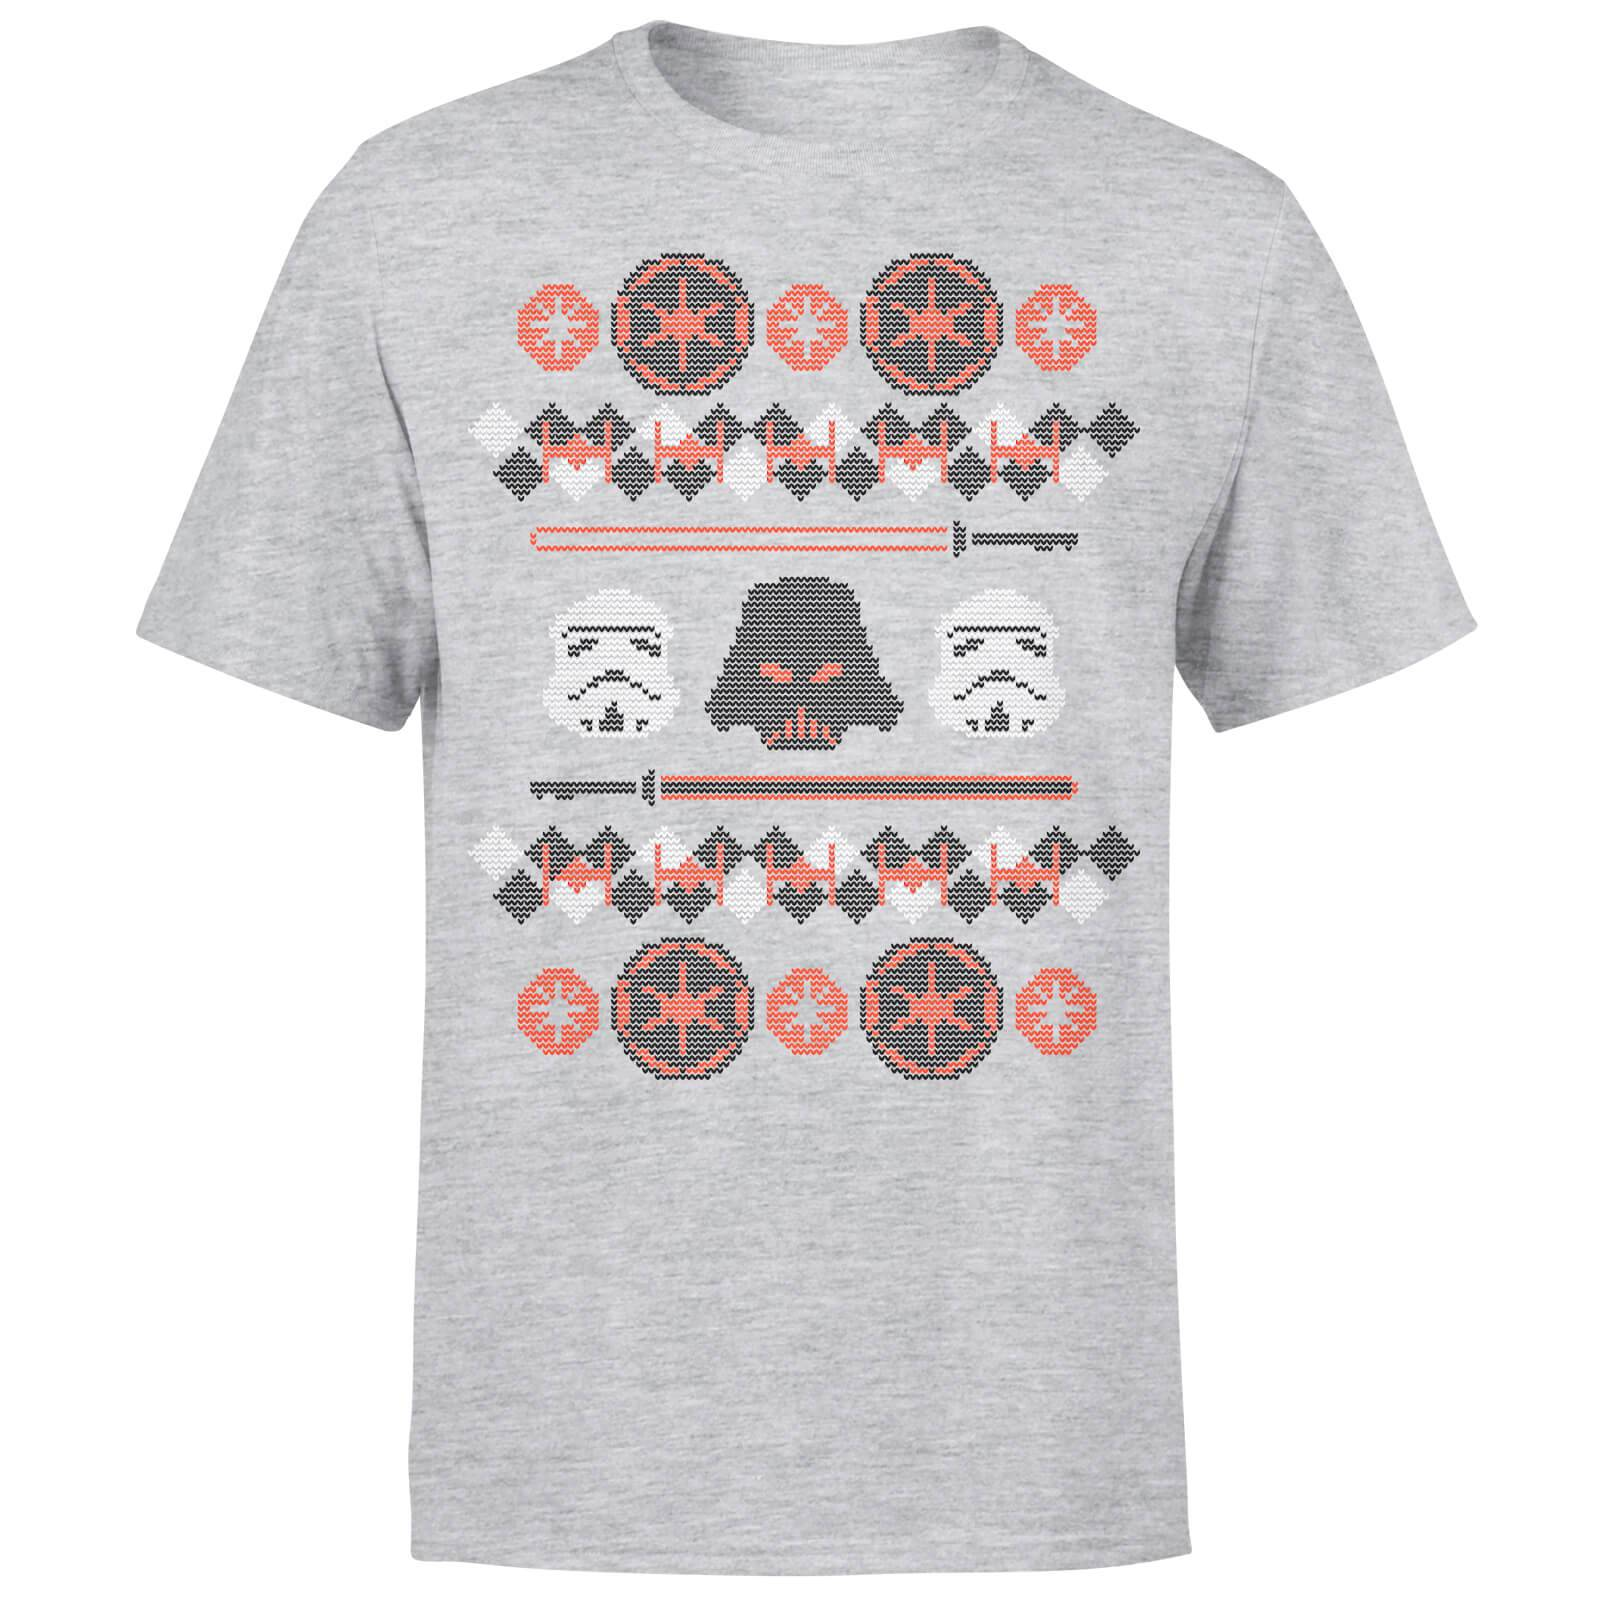 Star Wars T-Shirt Homme Sucre d'Orge Yoda Star Wars - Noir - XL - Gris